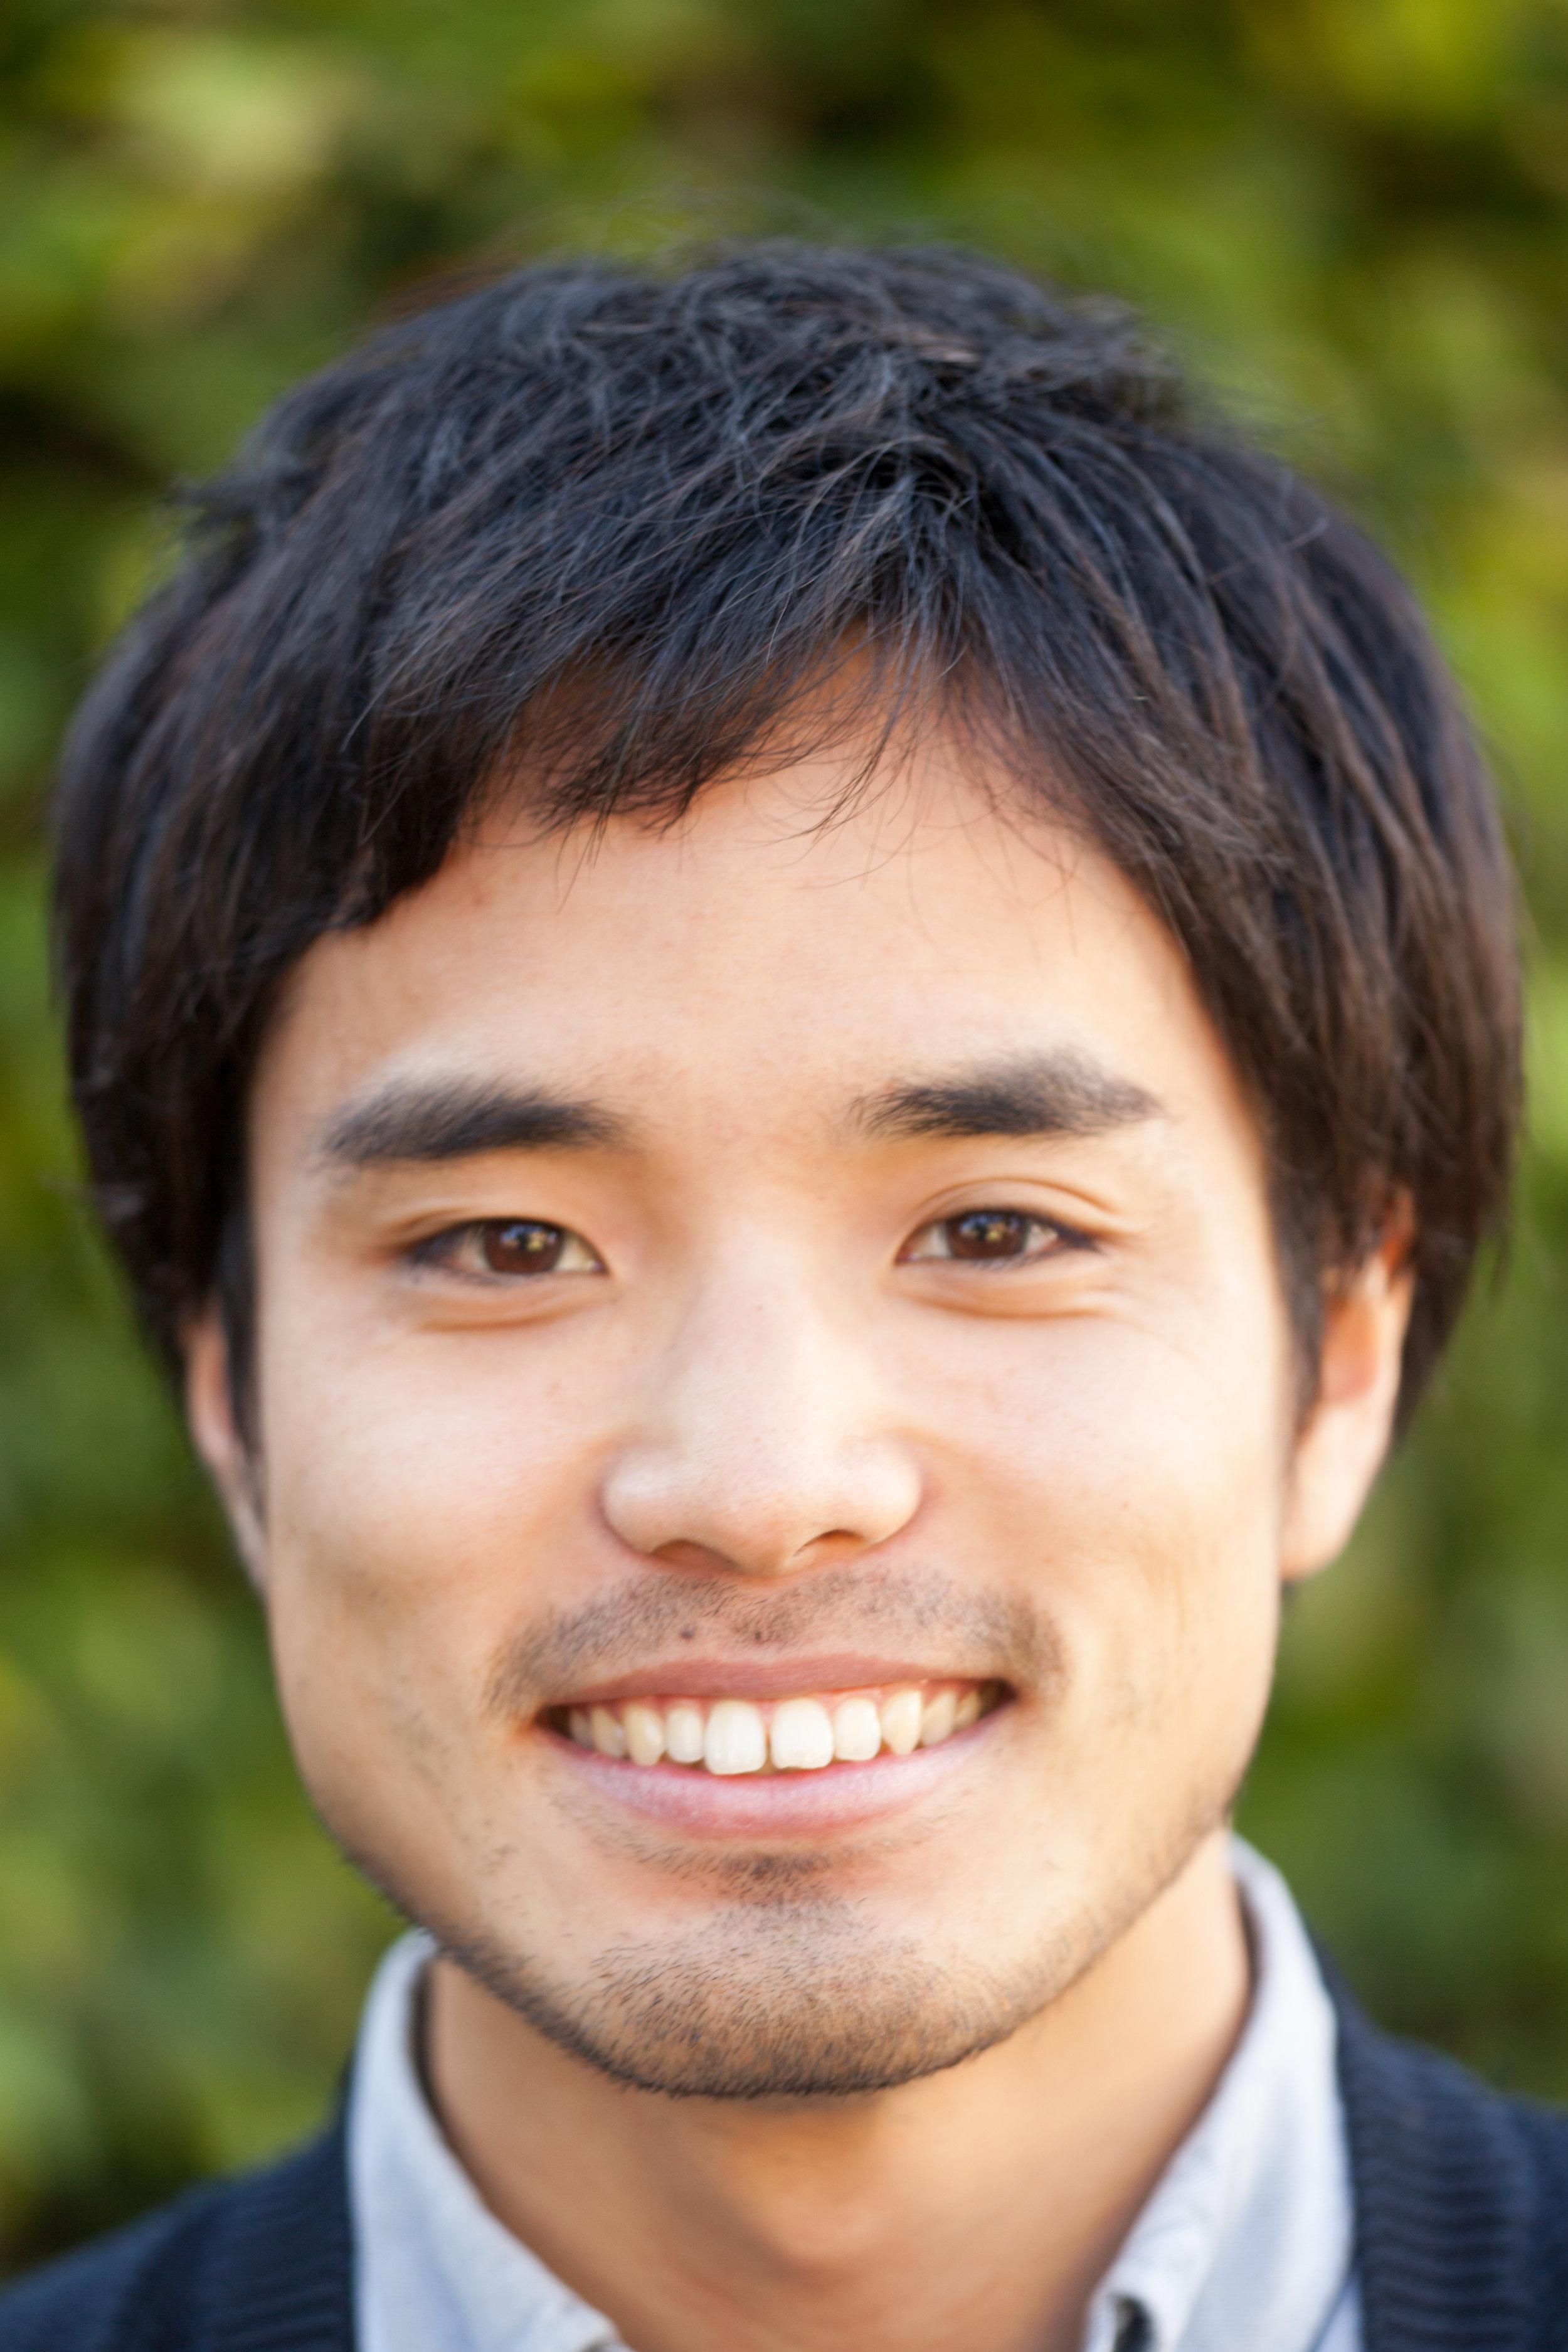 Wayo Matsushima - The Nakajima Foundation, St John's College Benefactors' ScholarMD 2015 Tohoku University, Japanwm286@cam.ac.uk